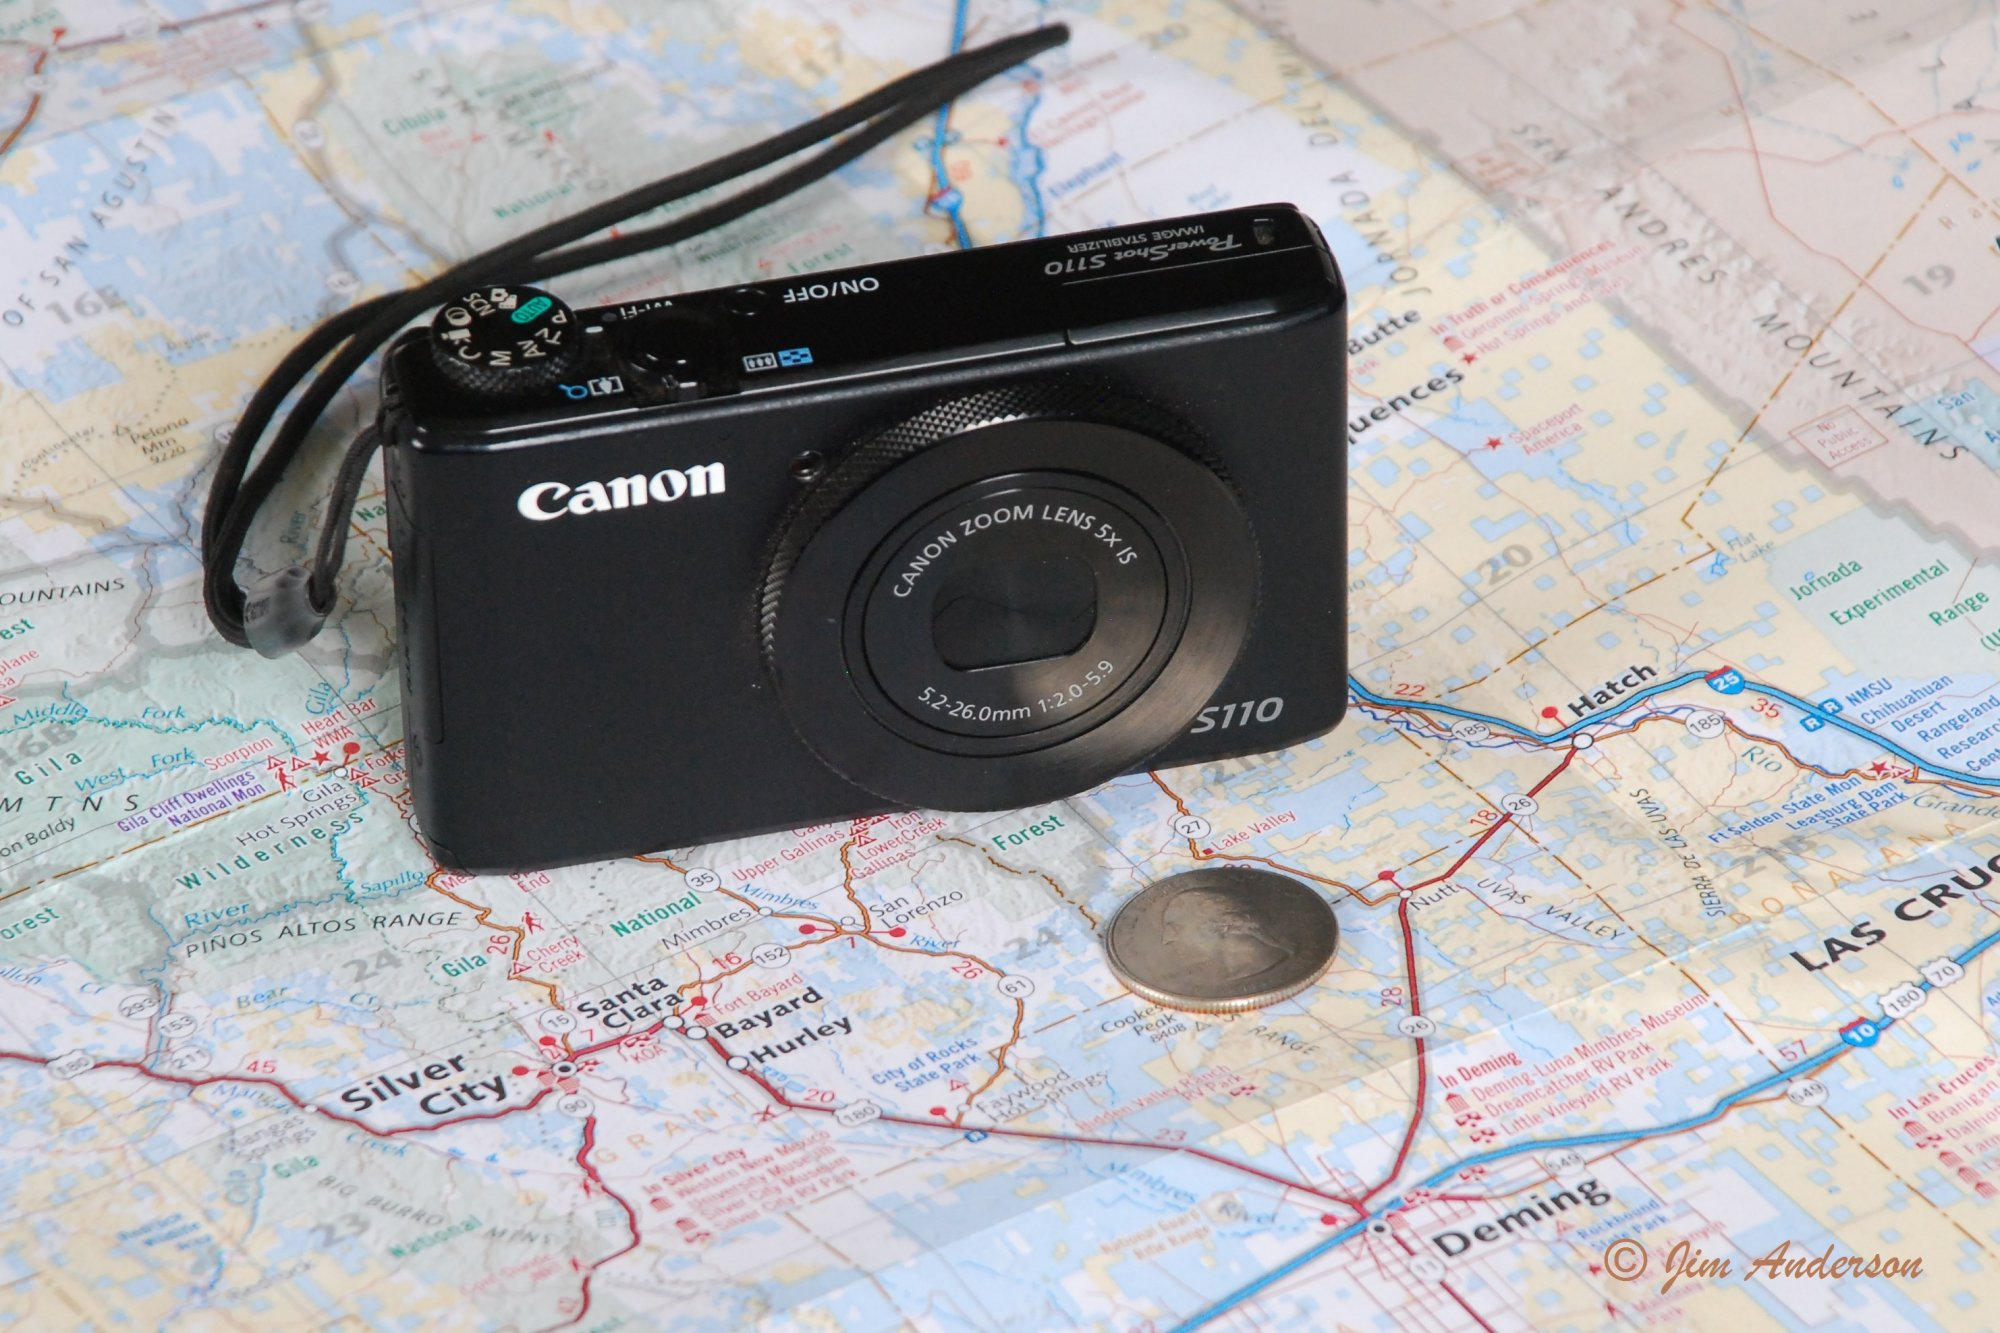 DSC_1028_Canon_S110.JPG